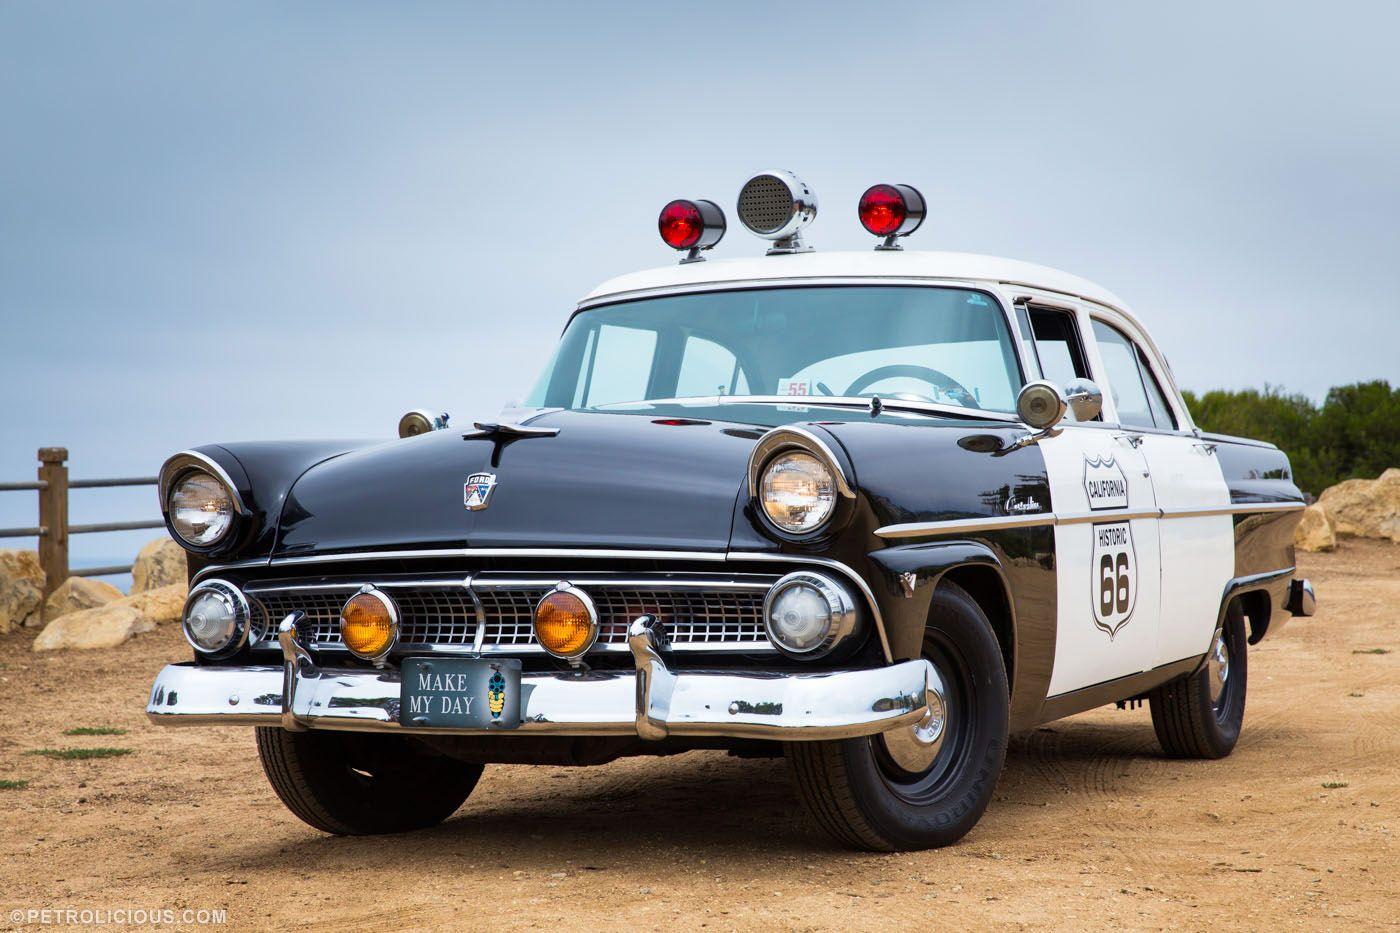 1956 ford customline wagon old car hunt - Grab A Dozen Donuts In This Original 55 Ford Police Car